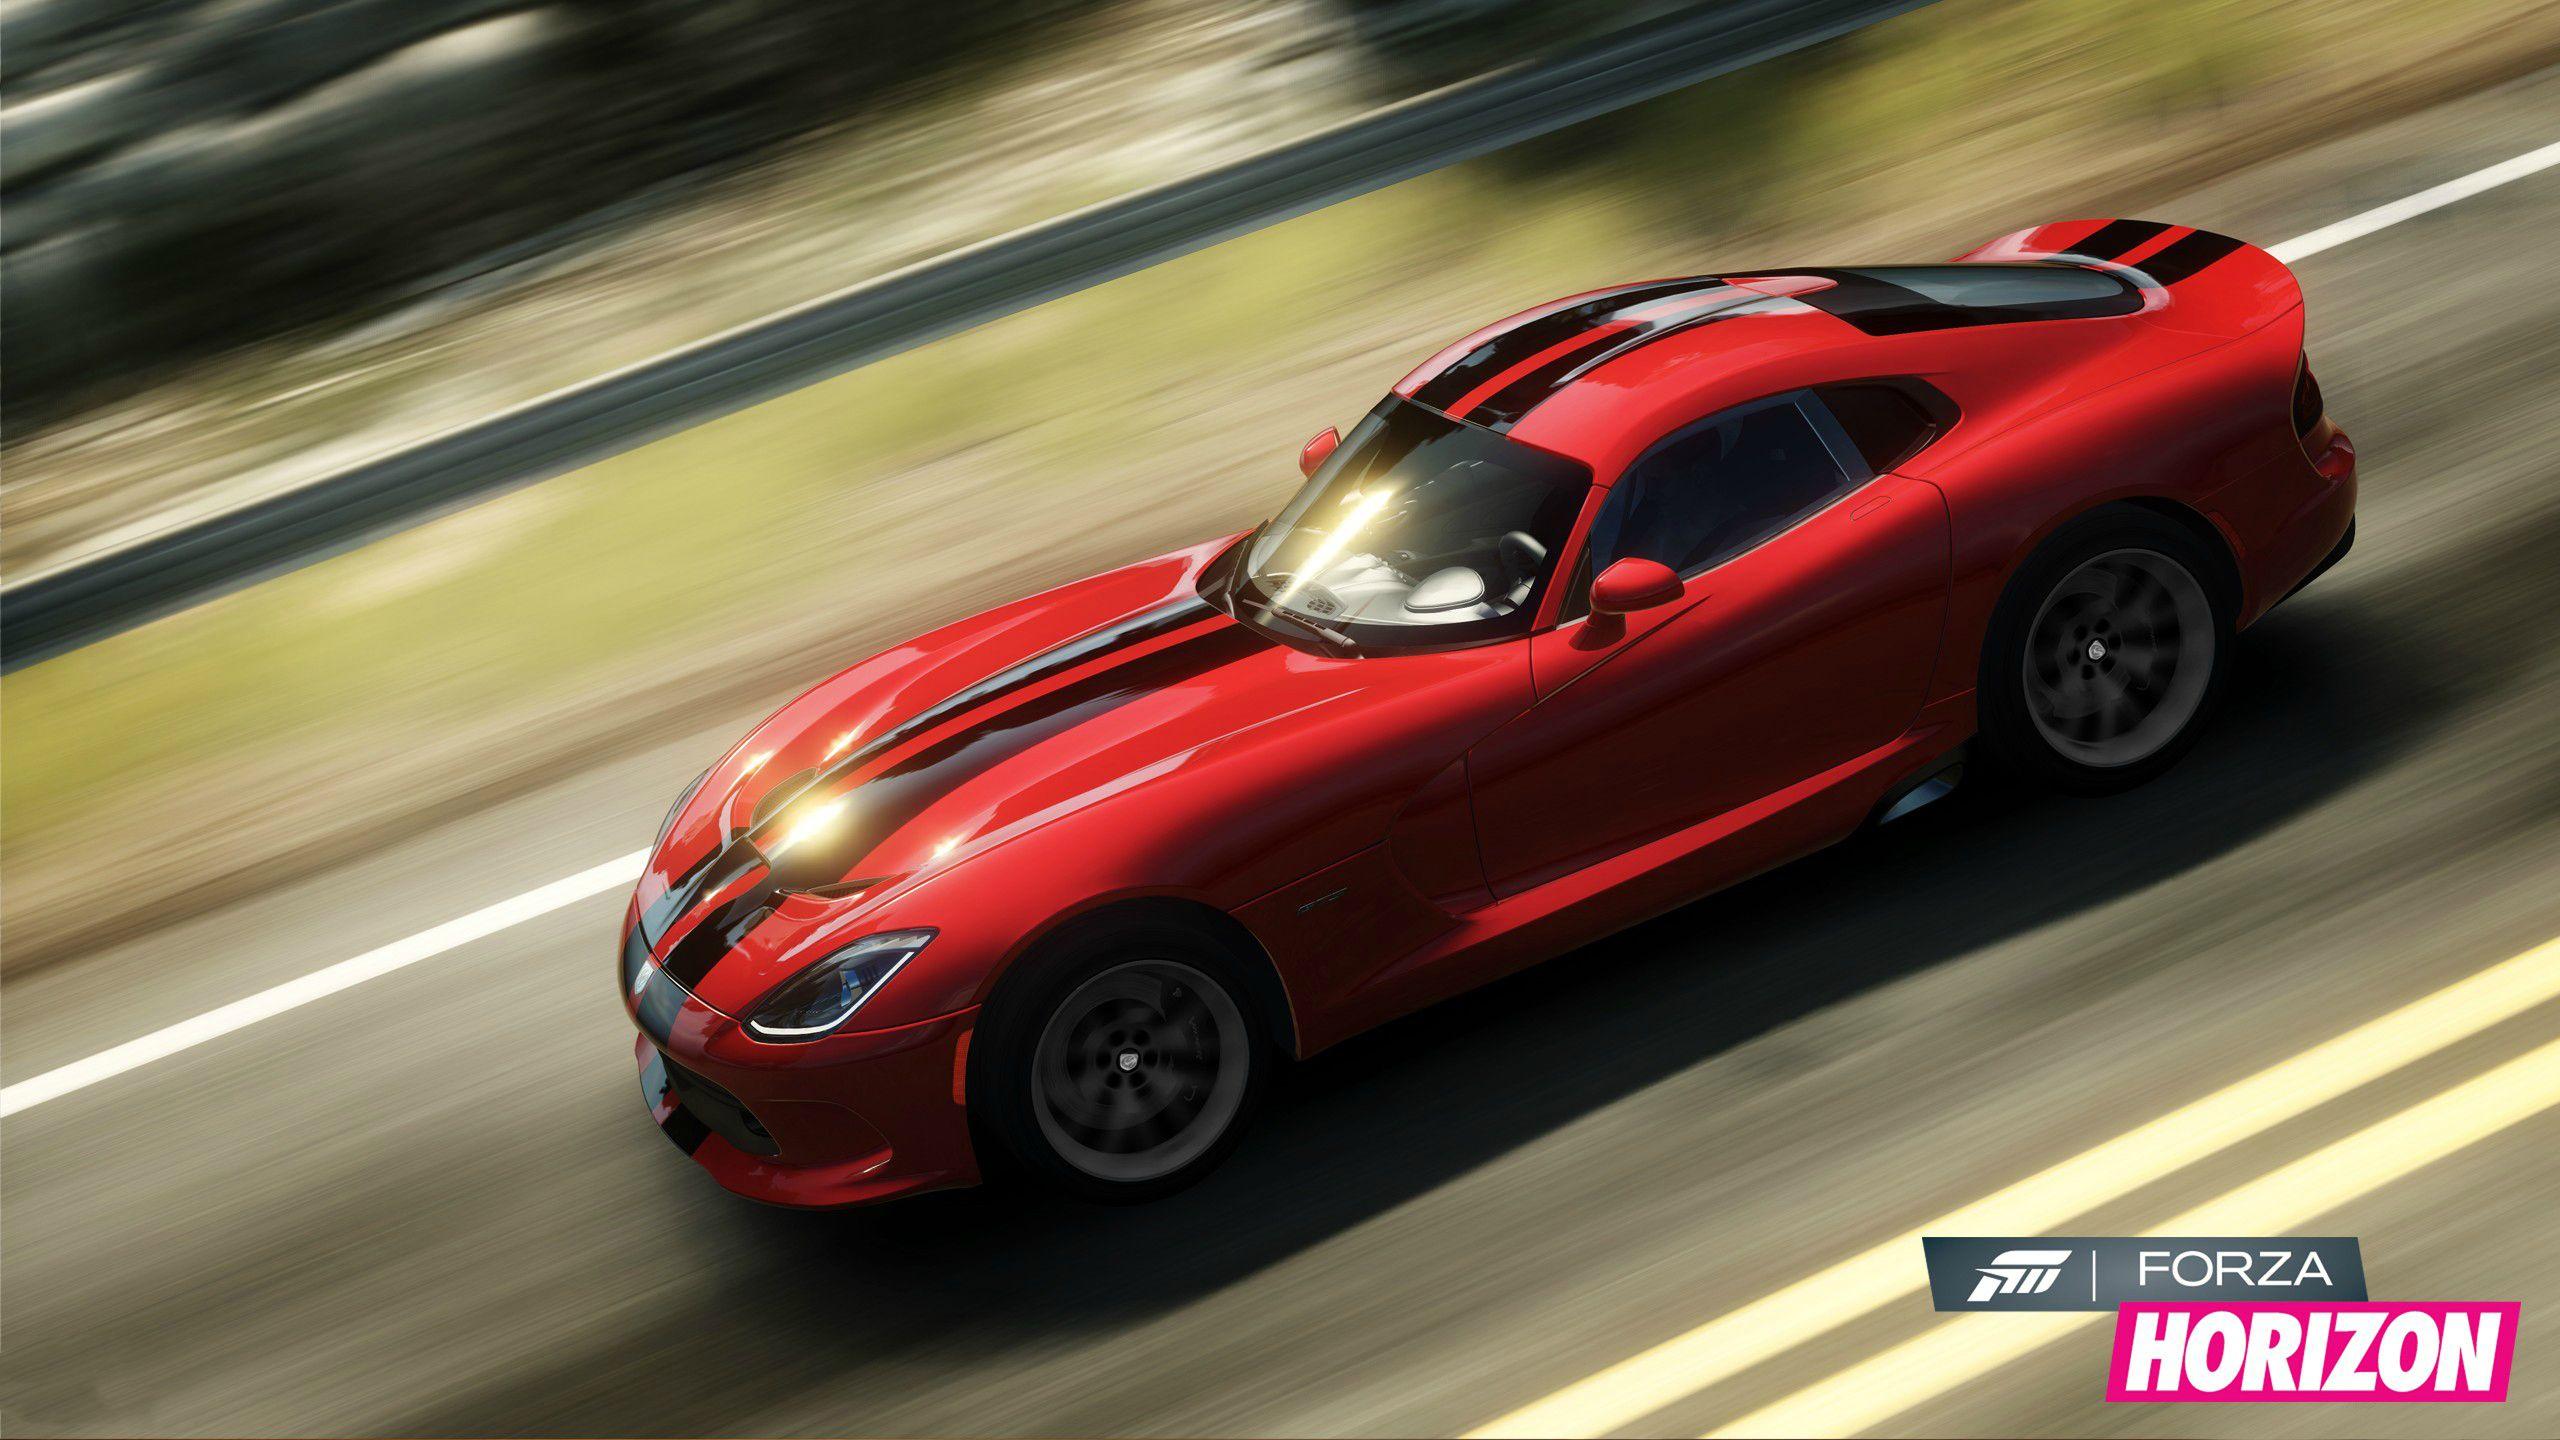 of Forza Horizon You are downloading Forza Horizon wallpaper 5 2560x1440